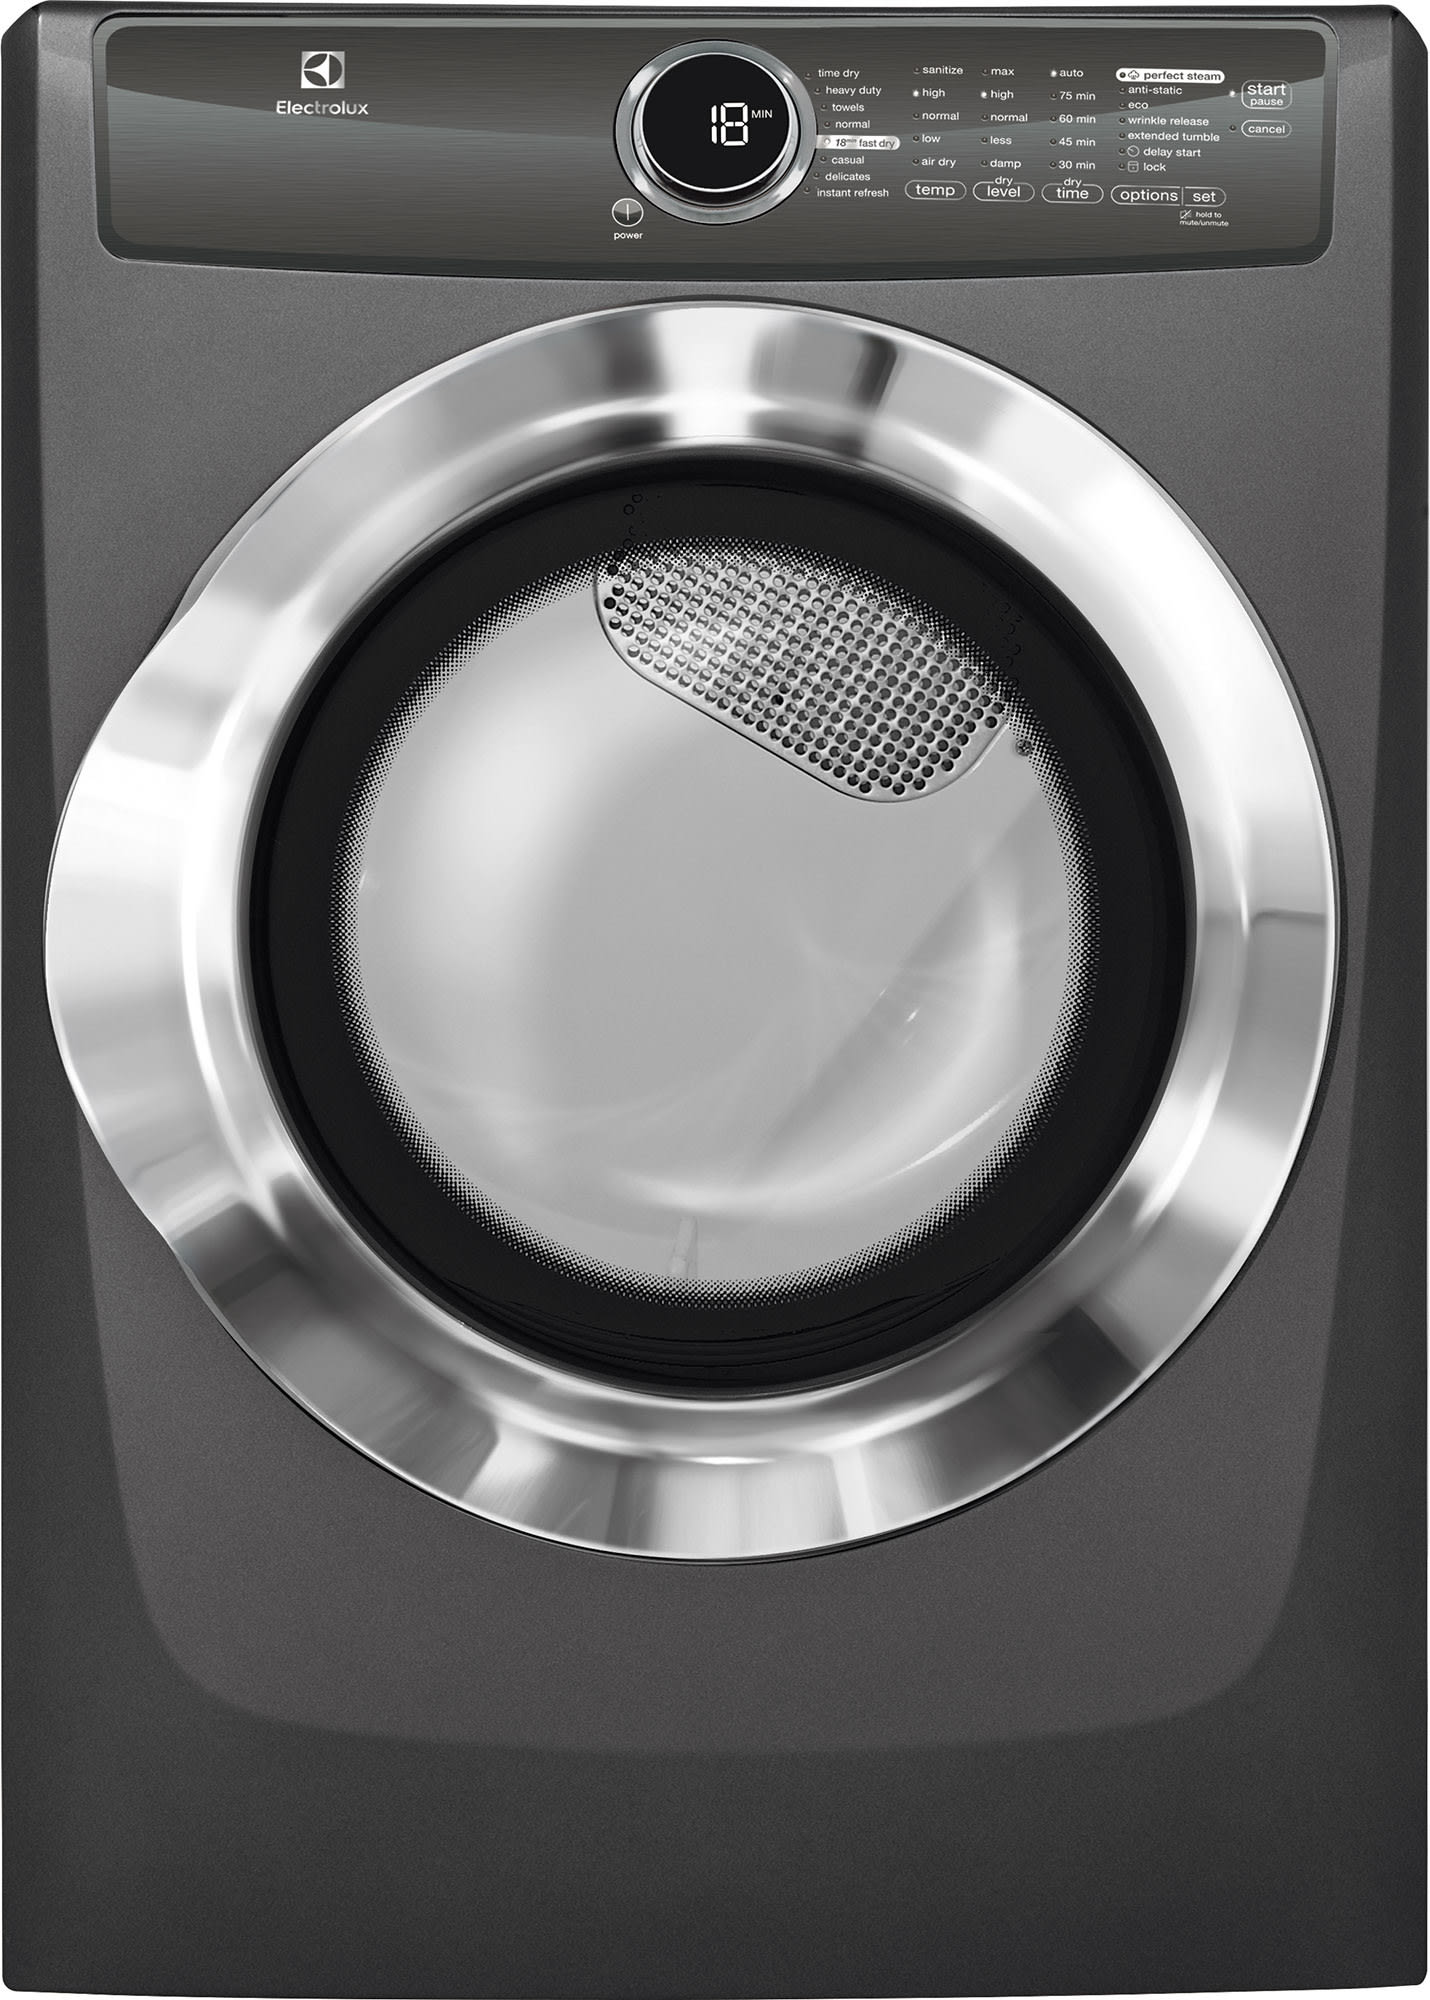 Electrolux Eifls55qt 27 Inch 4 2 Cu Ft Front Load Washer